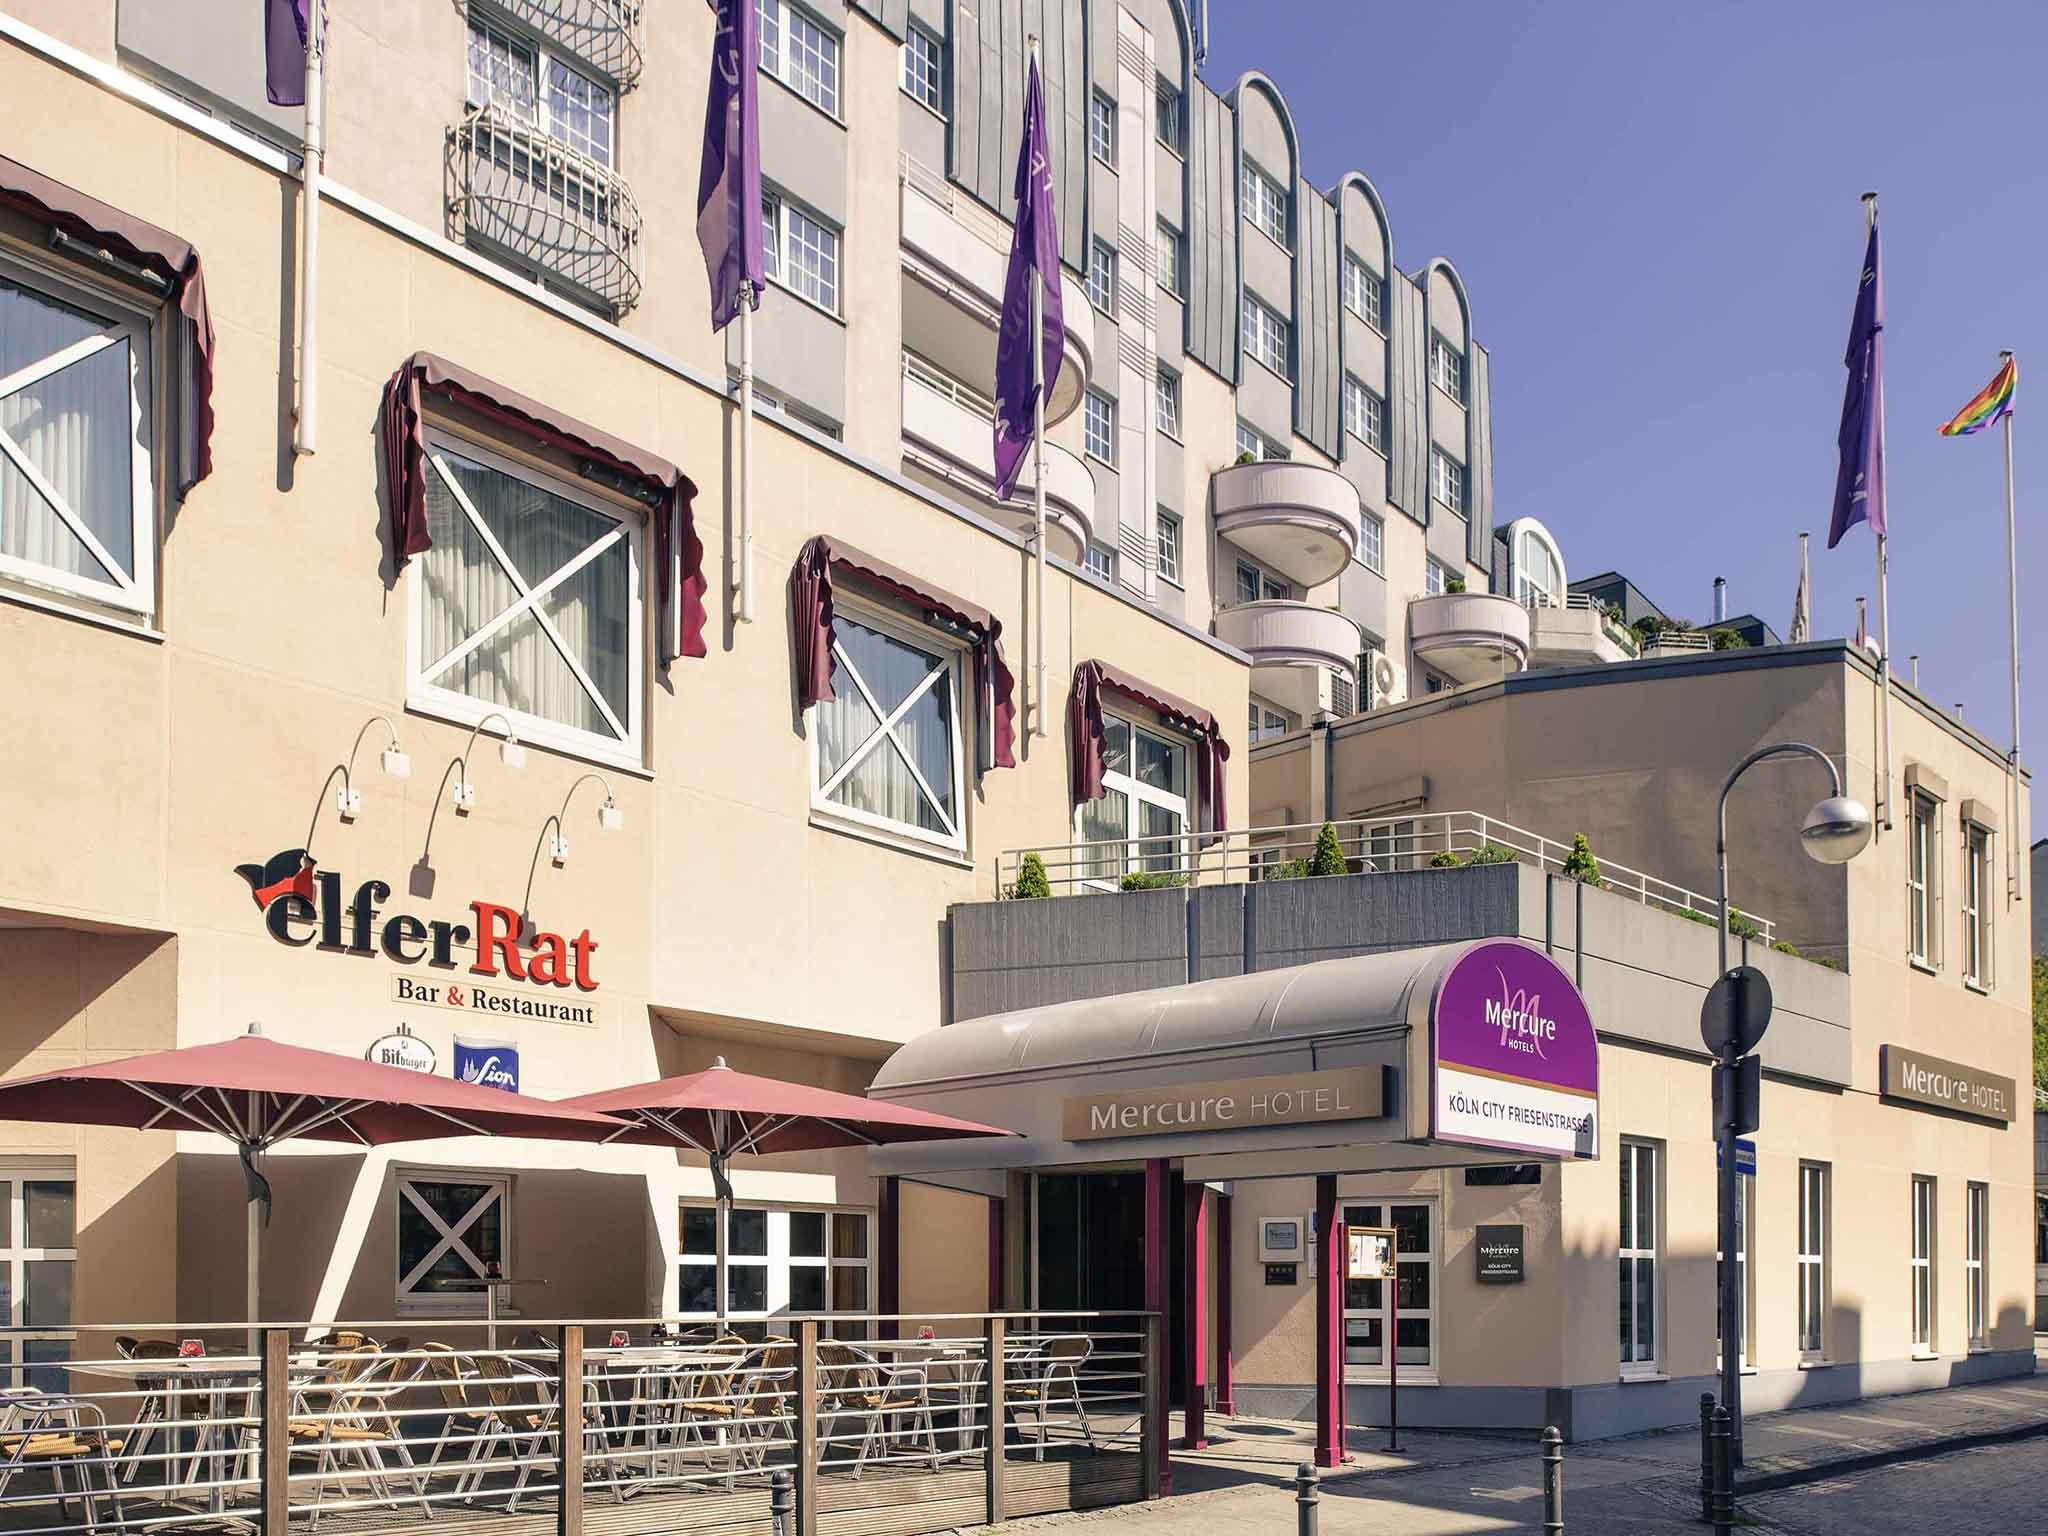 Hotell – Mercure Hotel Koeln City Friesenstrasse